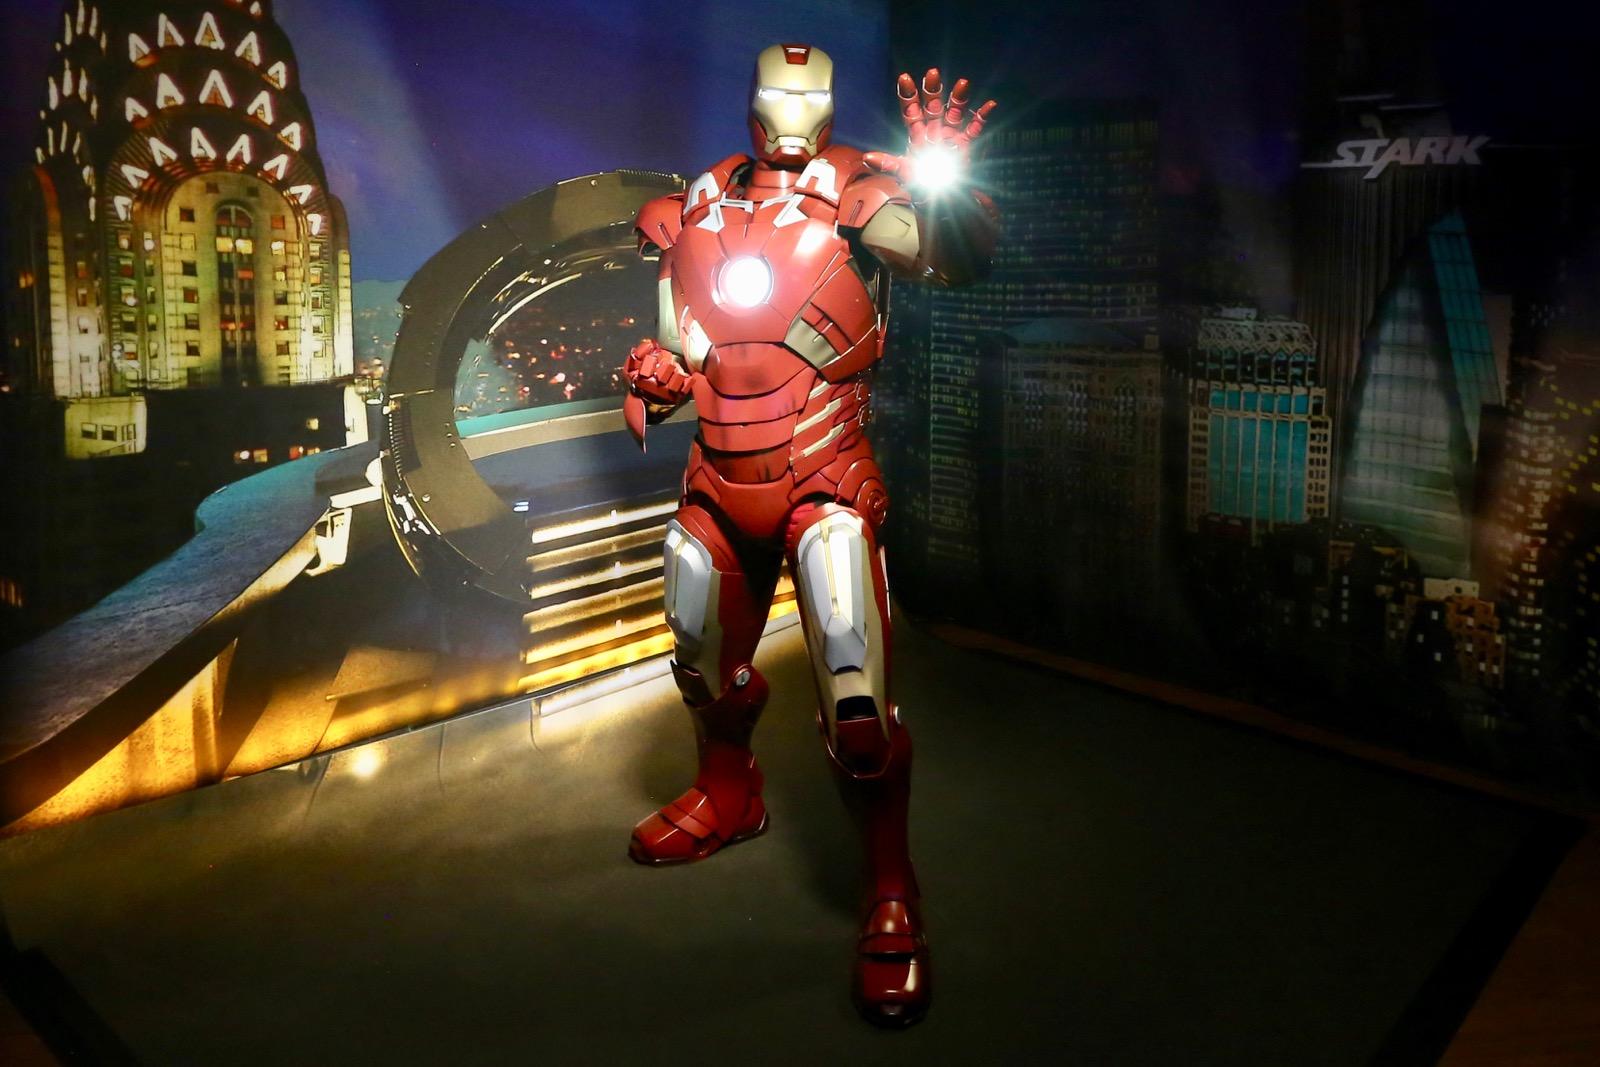 Iron Man (in costume)